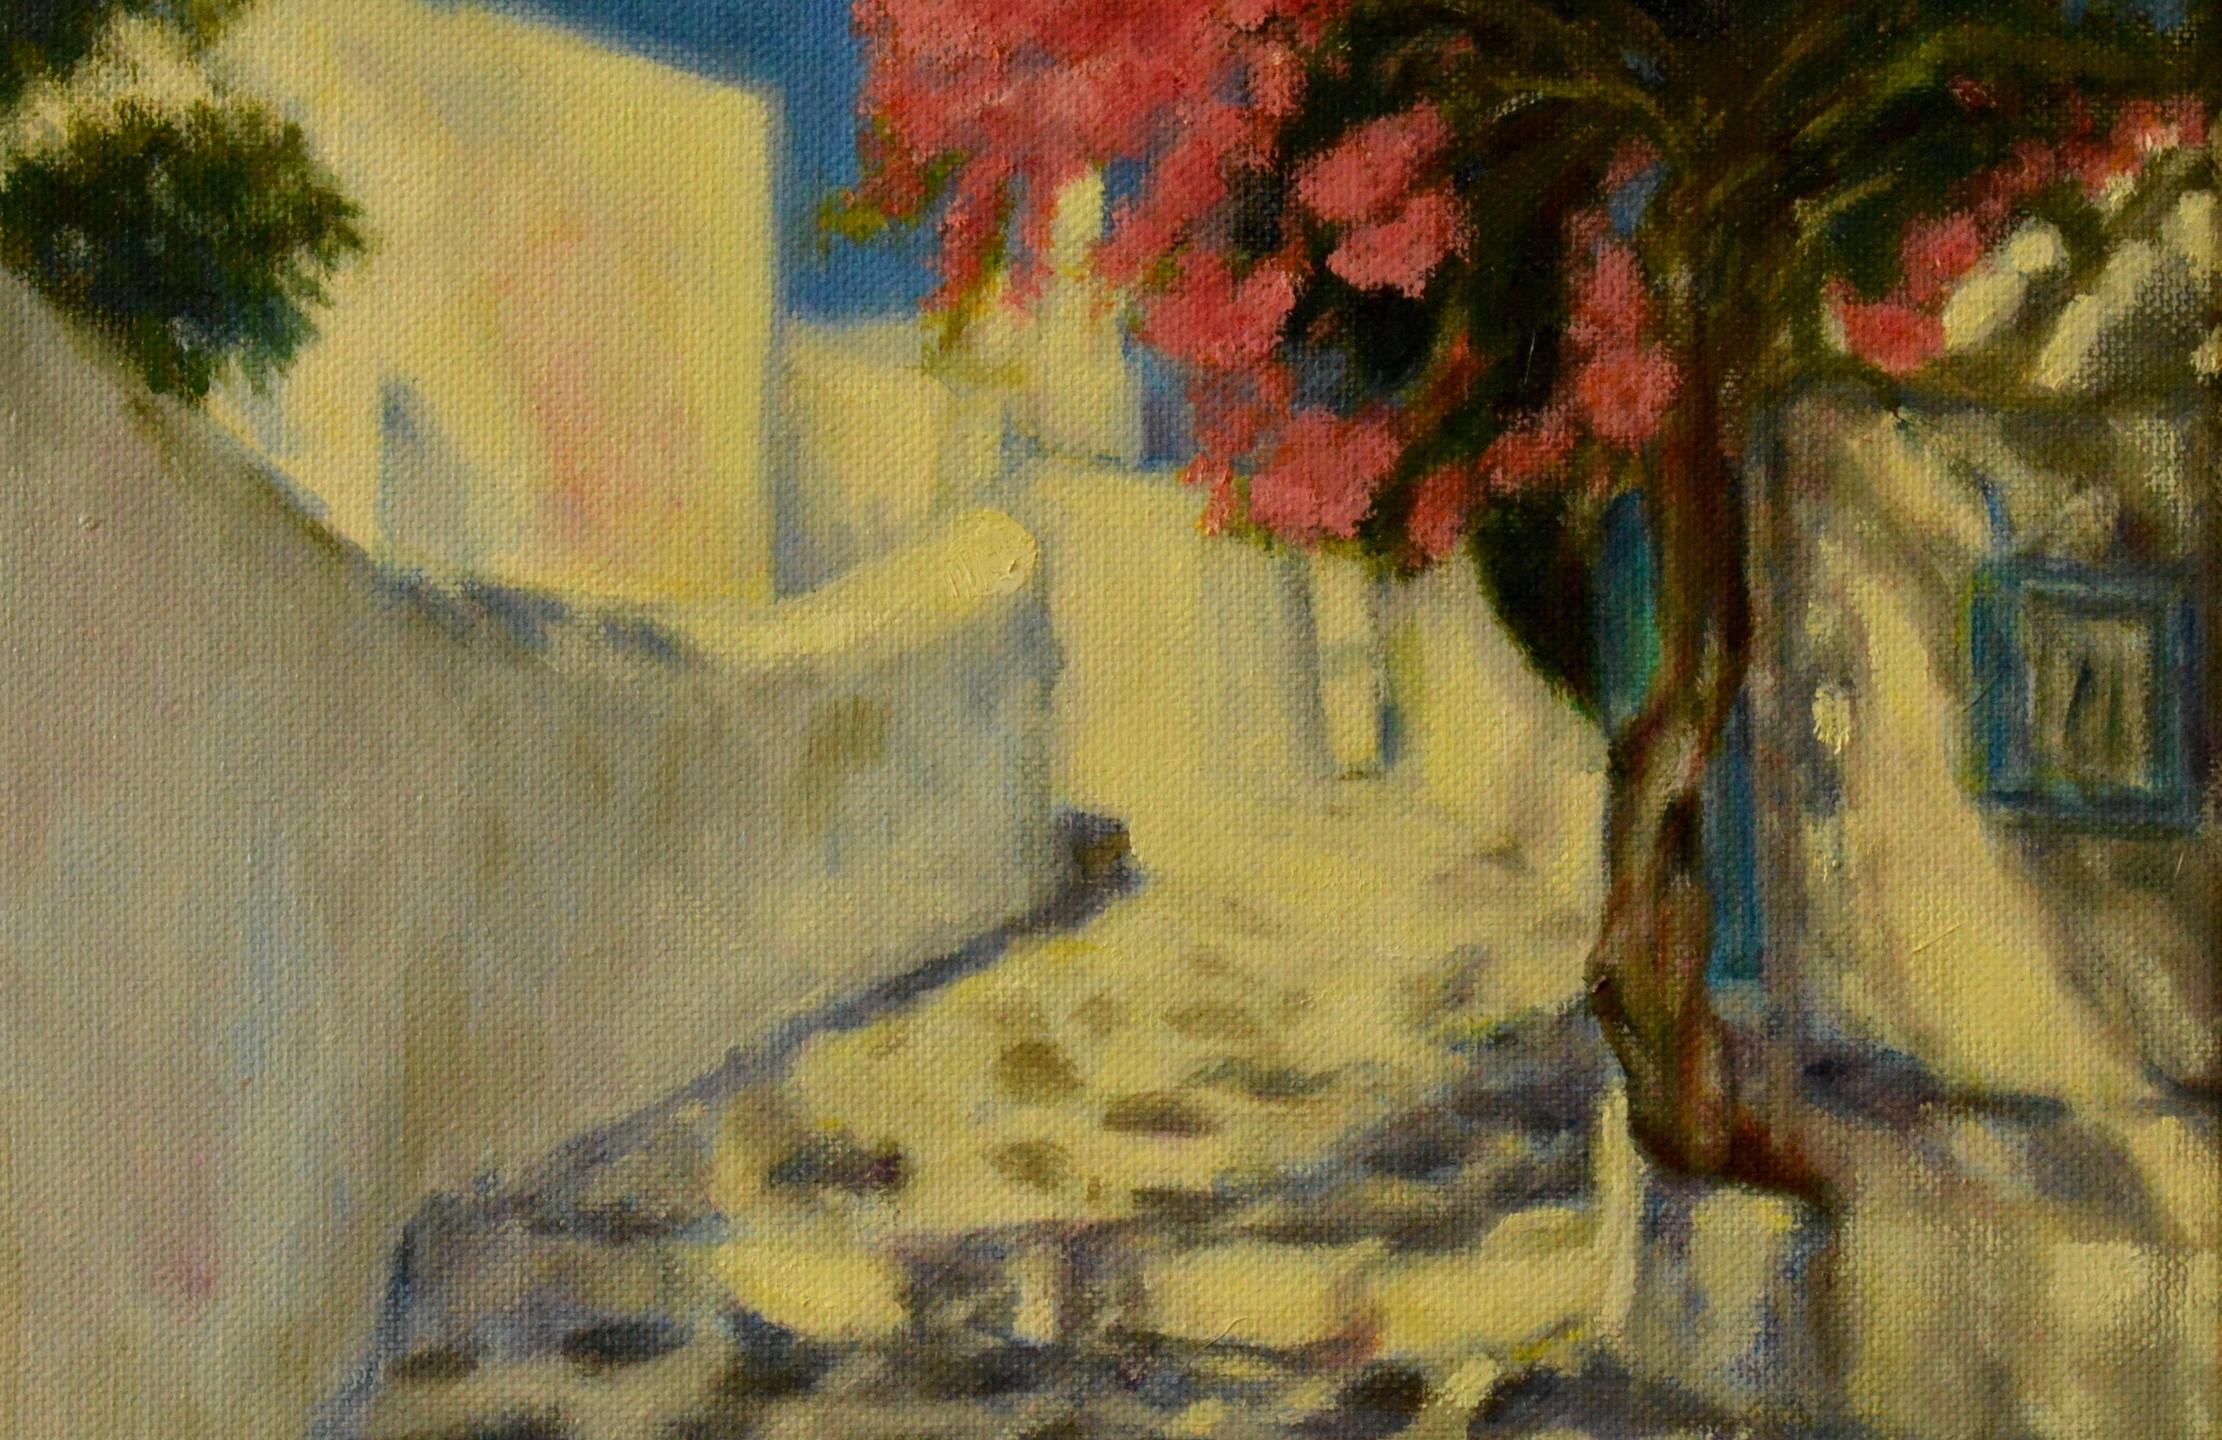 Sunlight through the alley